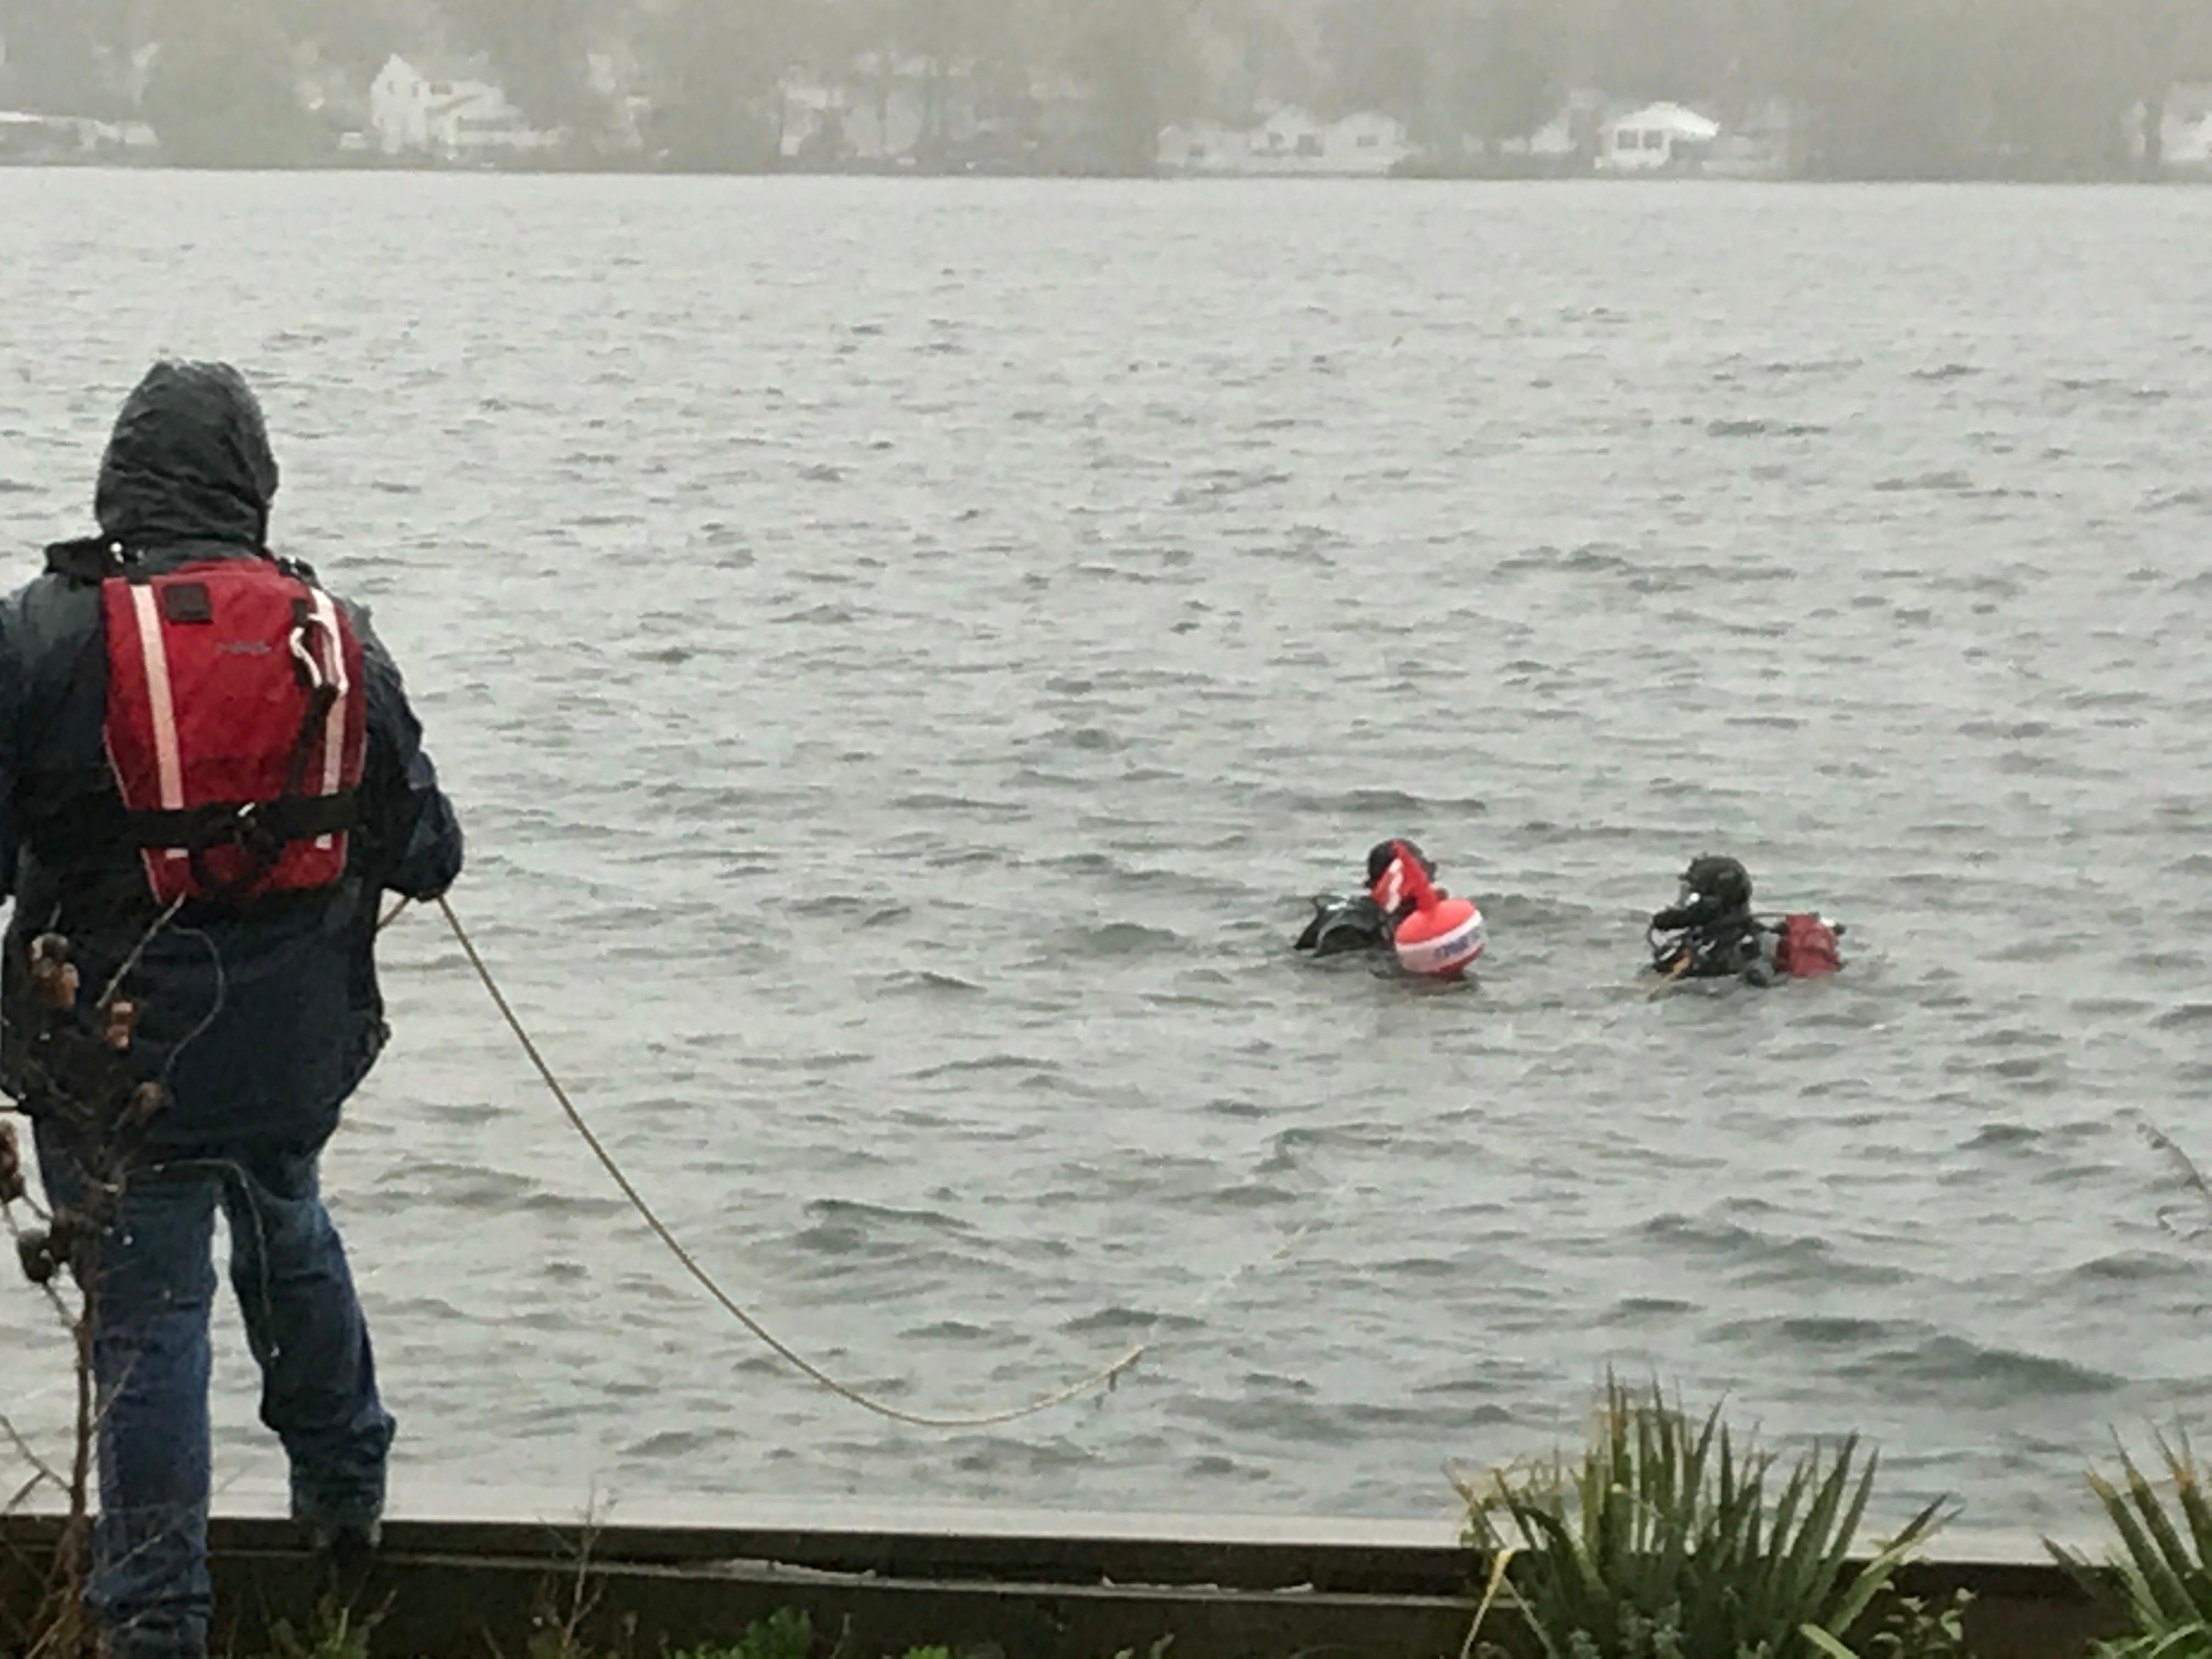 Responders verify phantom diver in Lake Parsippany